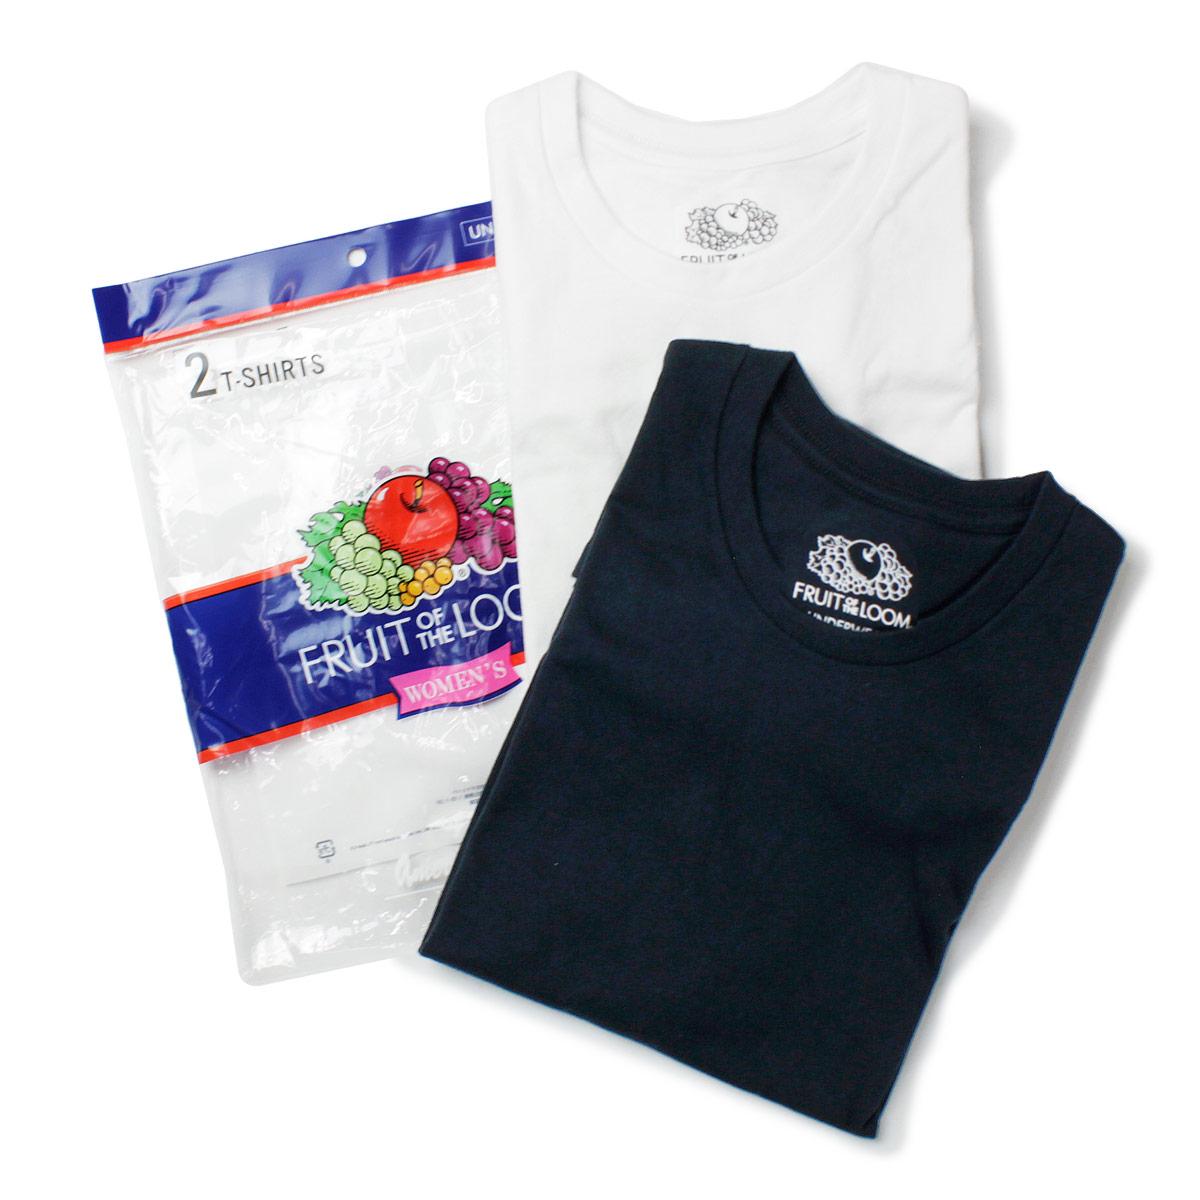 Fruit of the Loom フルーツオブザルーム クルーネックコットンTシャツ 2PACK